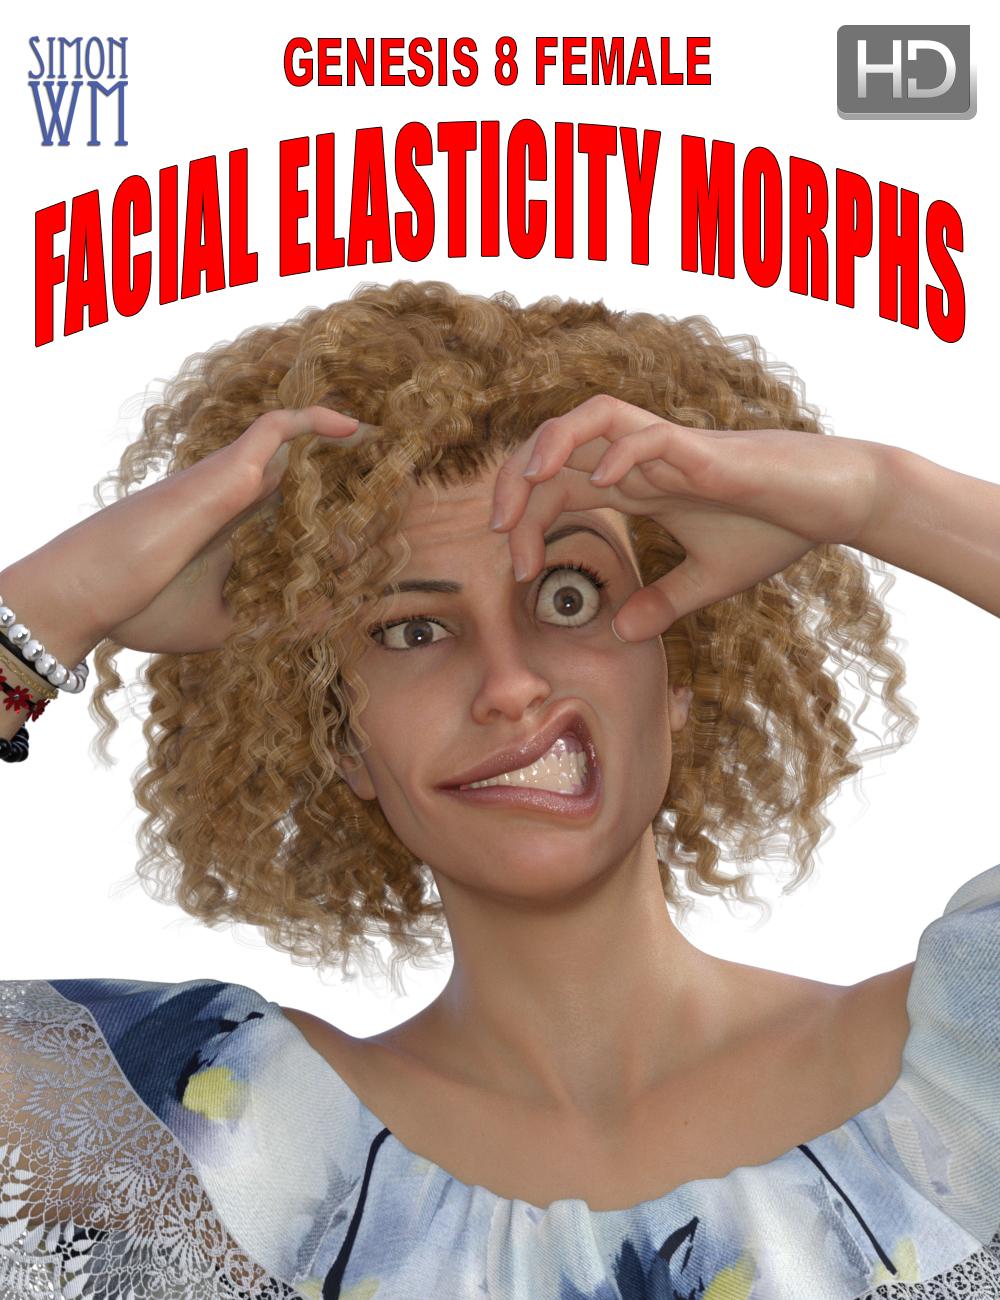 Genesis 8 Female Facial Elasticity Morphs by: SimonWM, 3D Models by Daz 3D